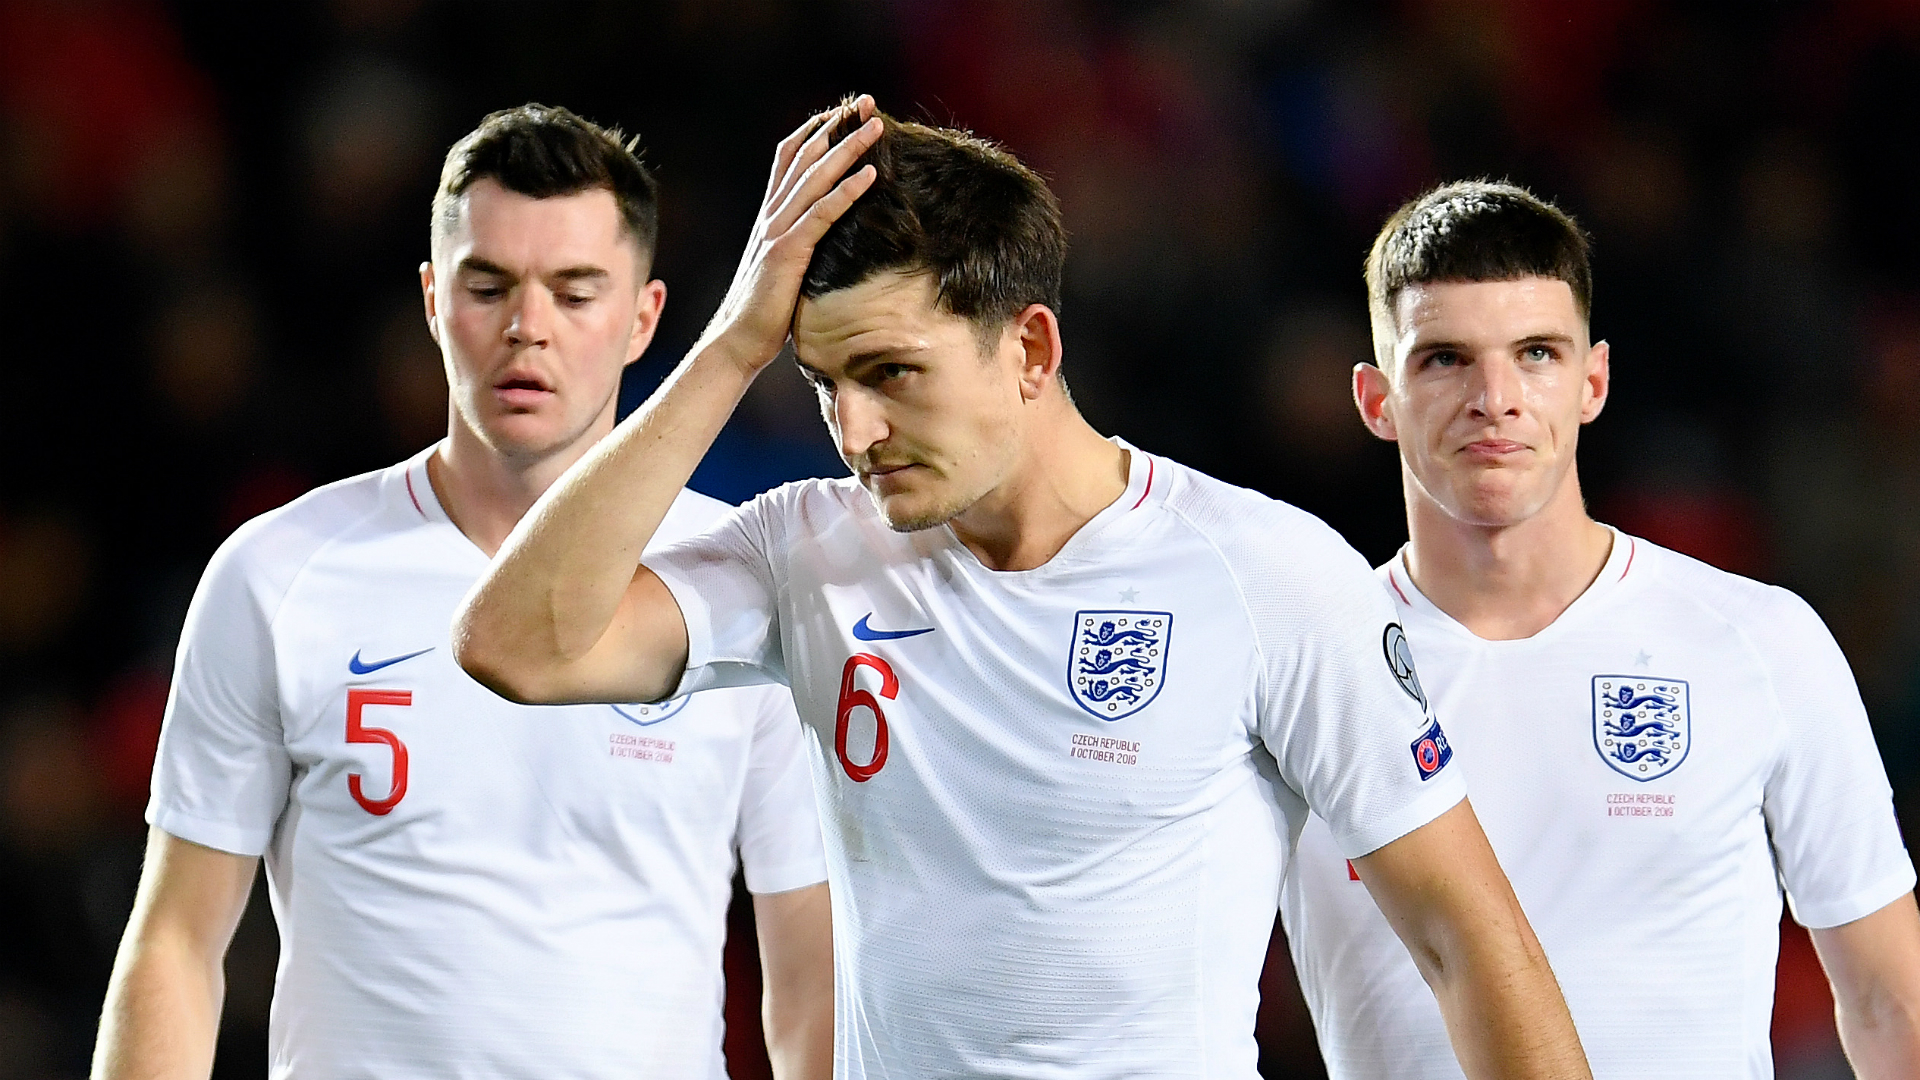 England not good enough in Prague loss - Southgate